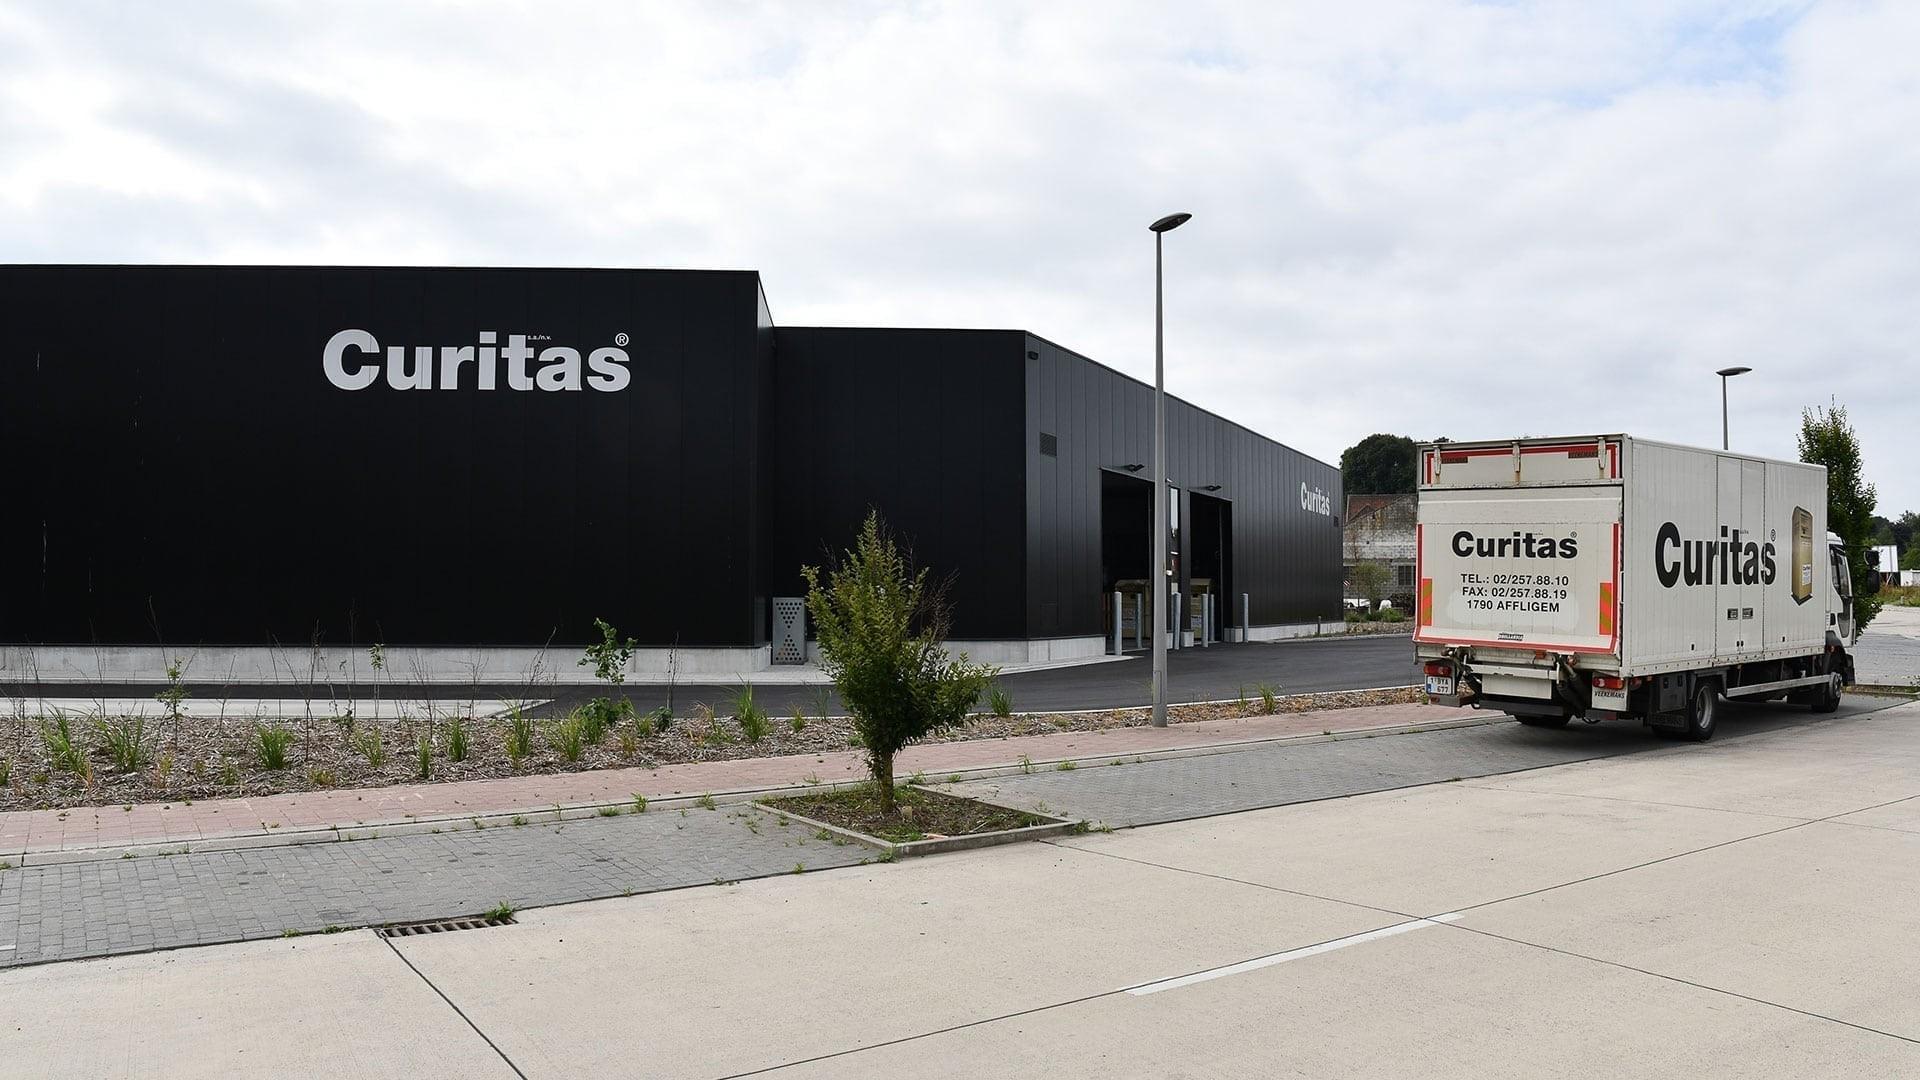 curitas-visual-3